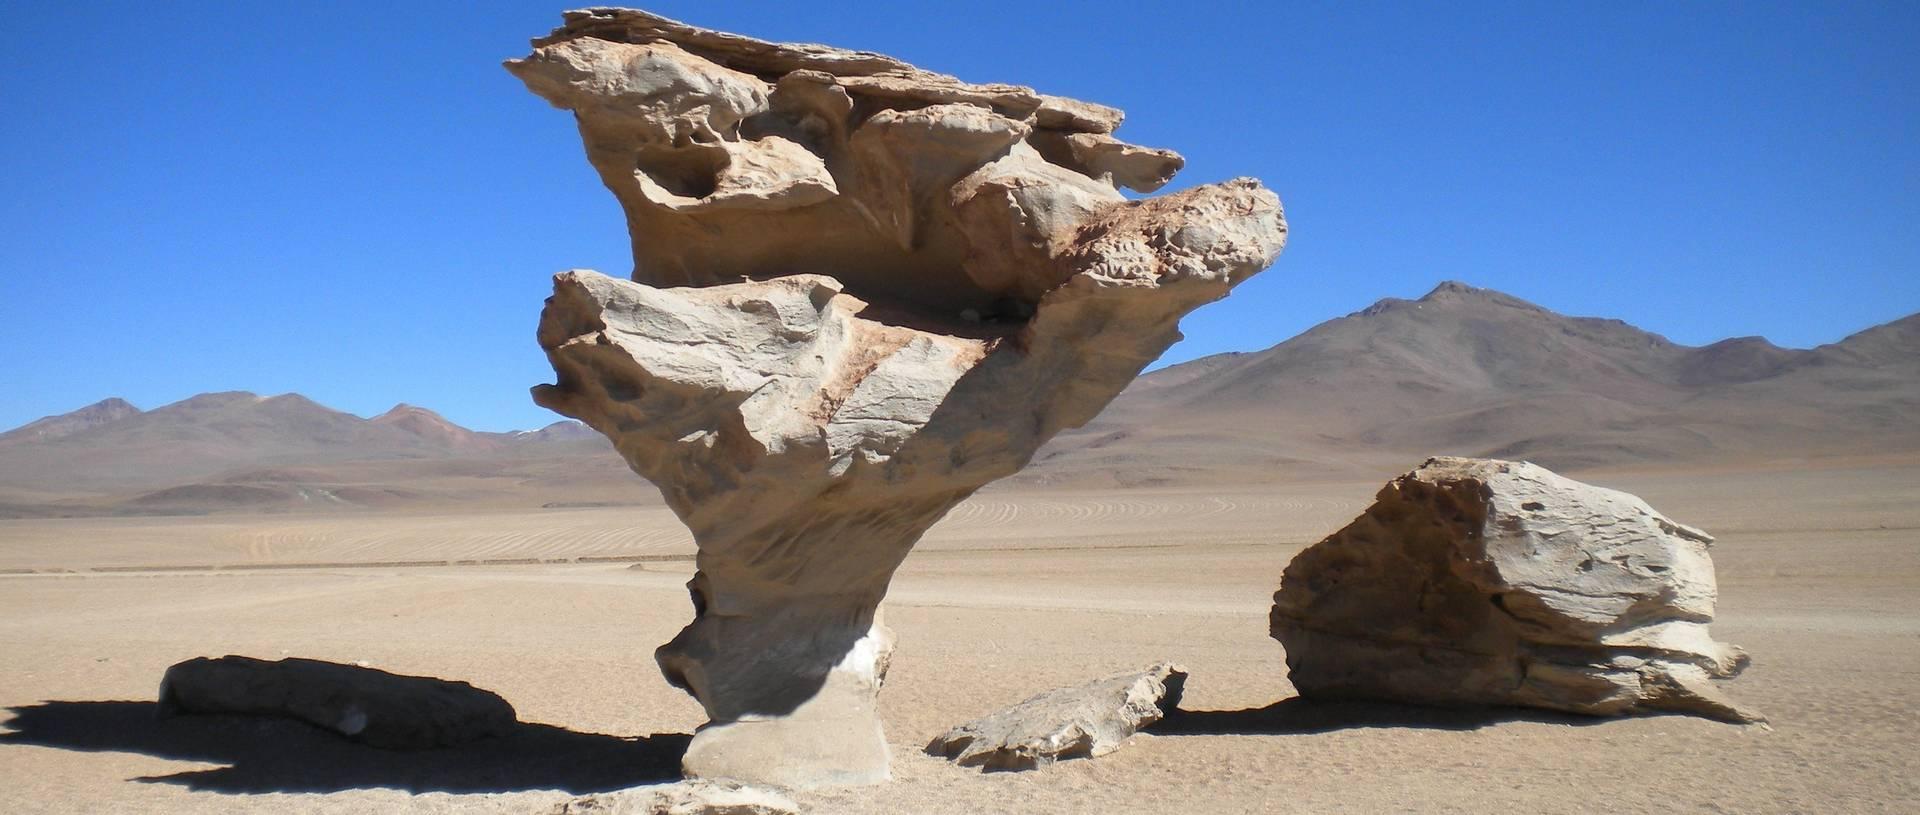 Arbol De Piedra (Stone Tree) In Dali'S Desert